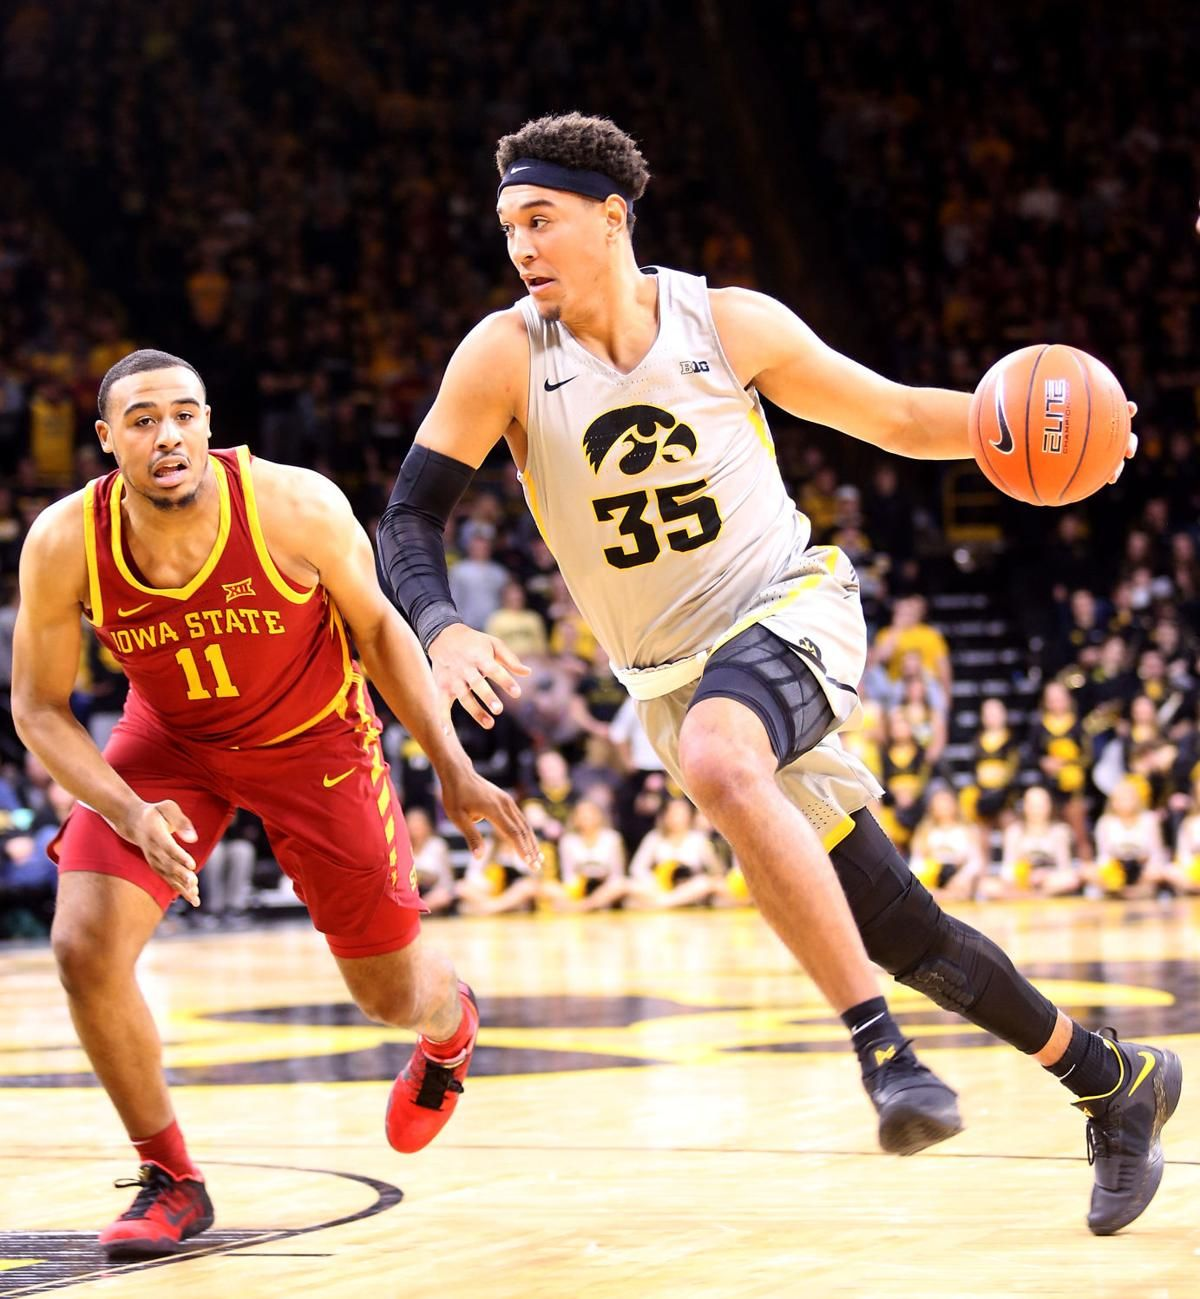 Pemsl Makes Surprising Return Gives Hawkeyes Boost Iowa State